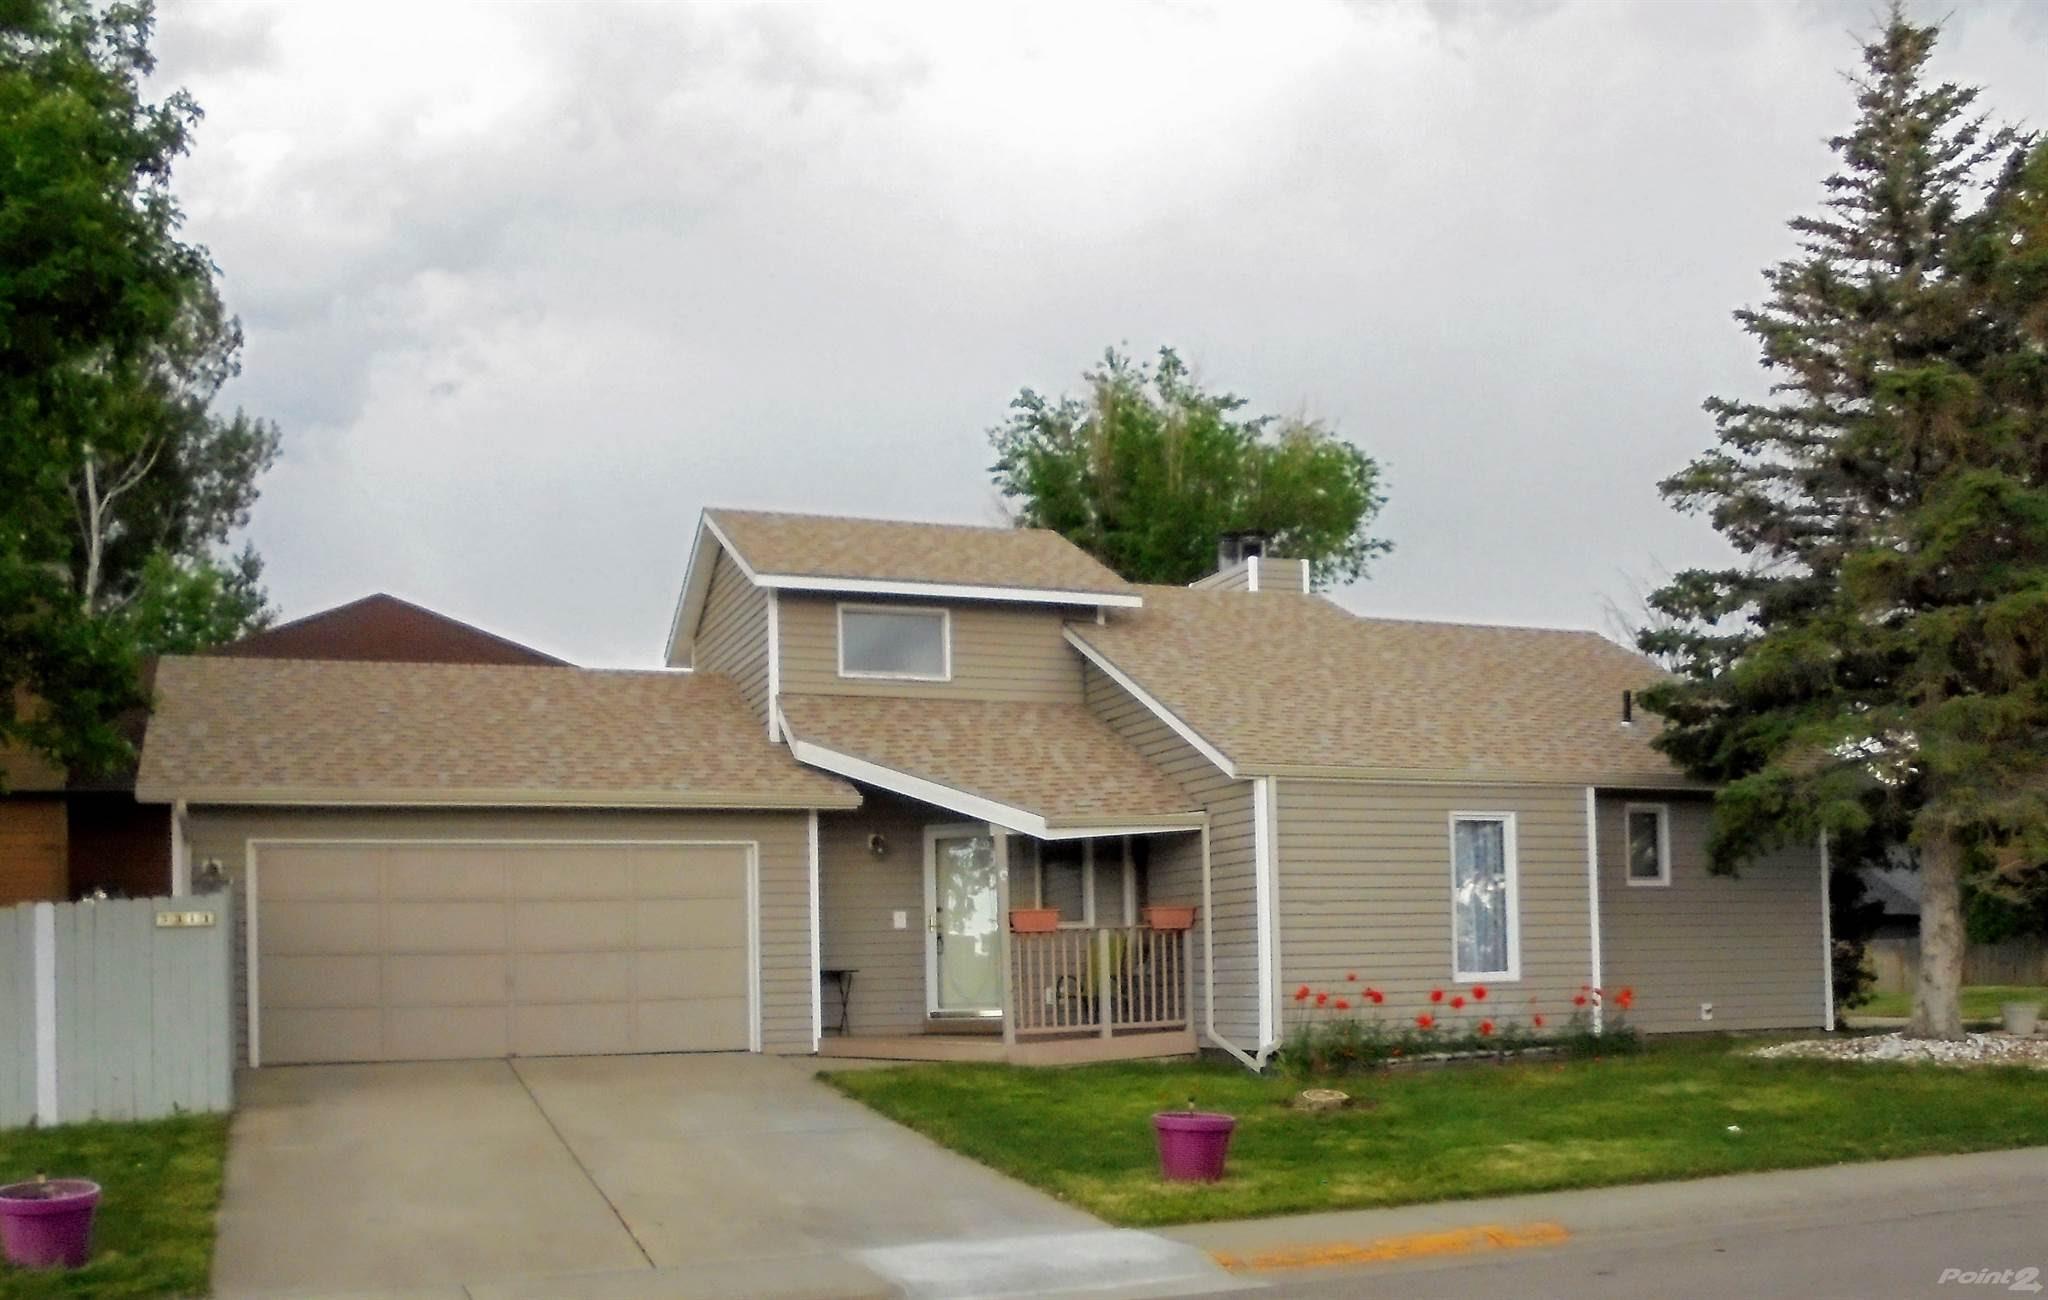 Casper homes for sale  Homes for sale in Casper WY  HomeGain